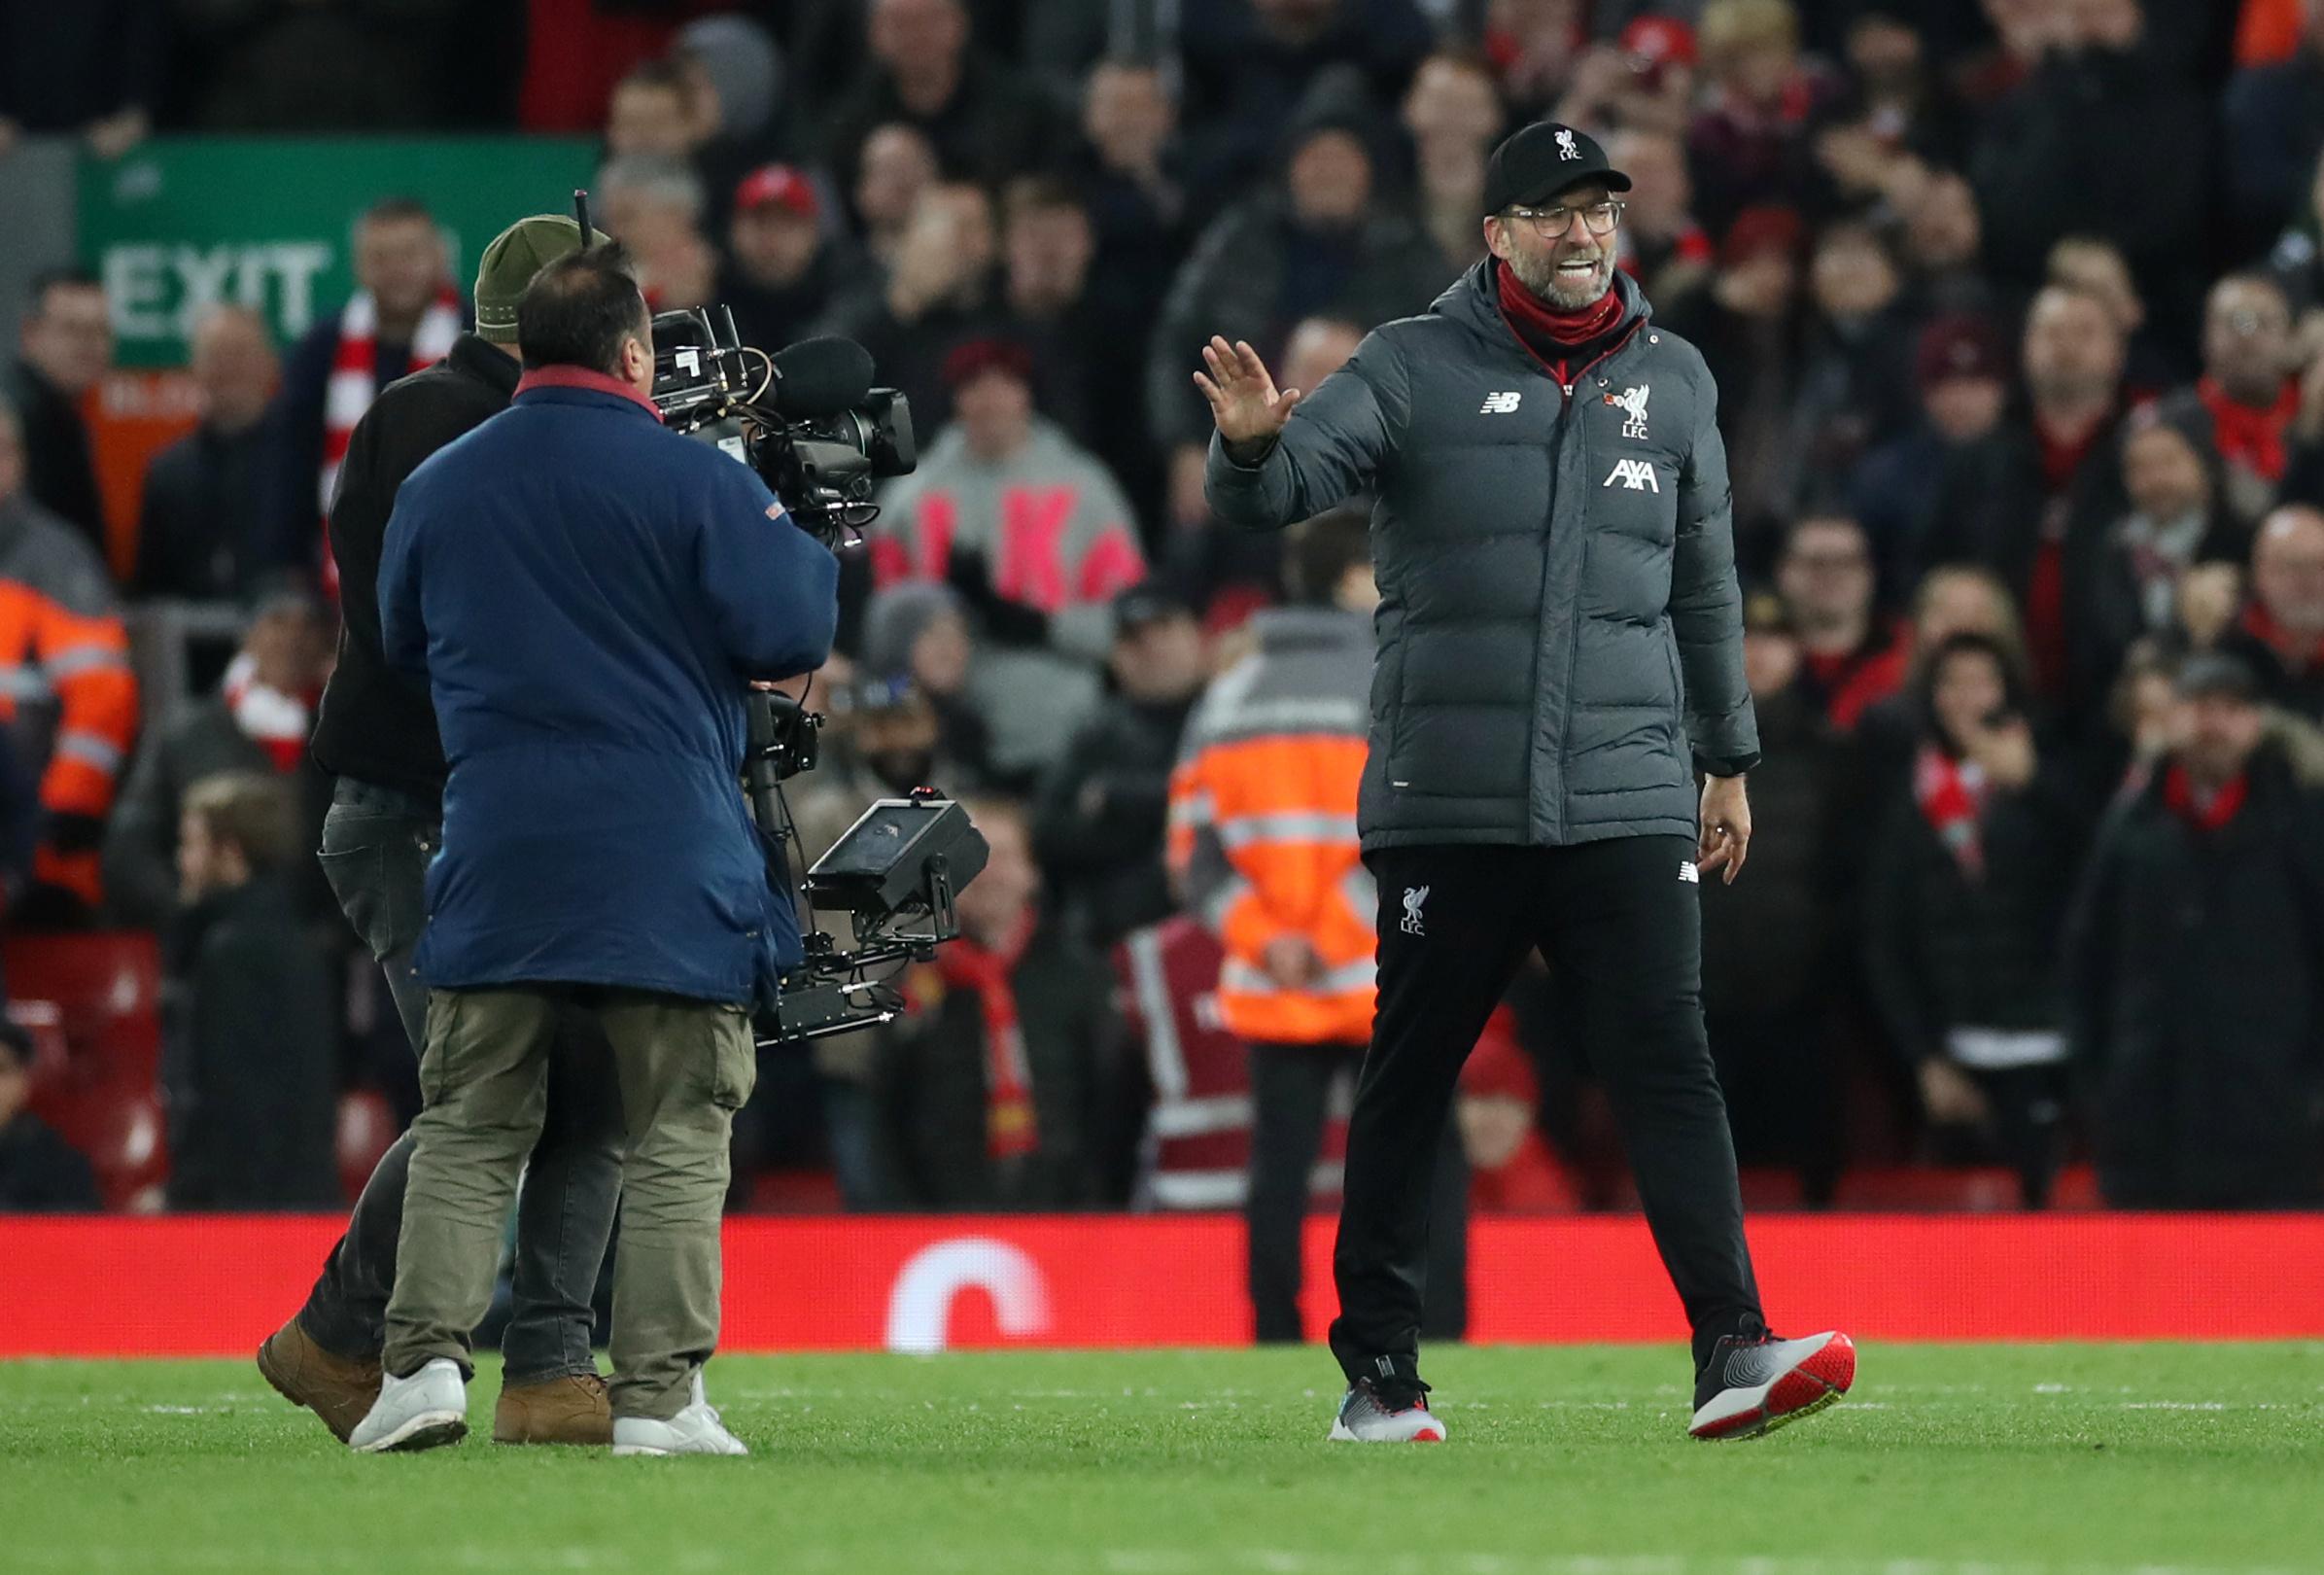 Klopp urged to focus on league